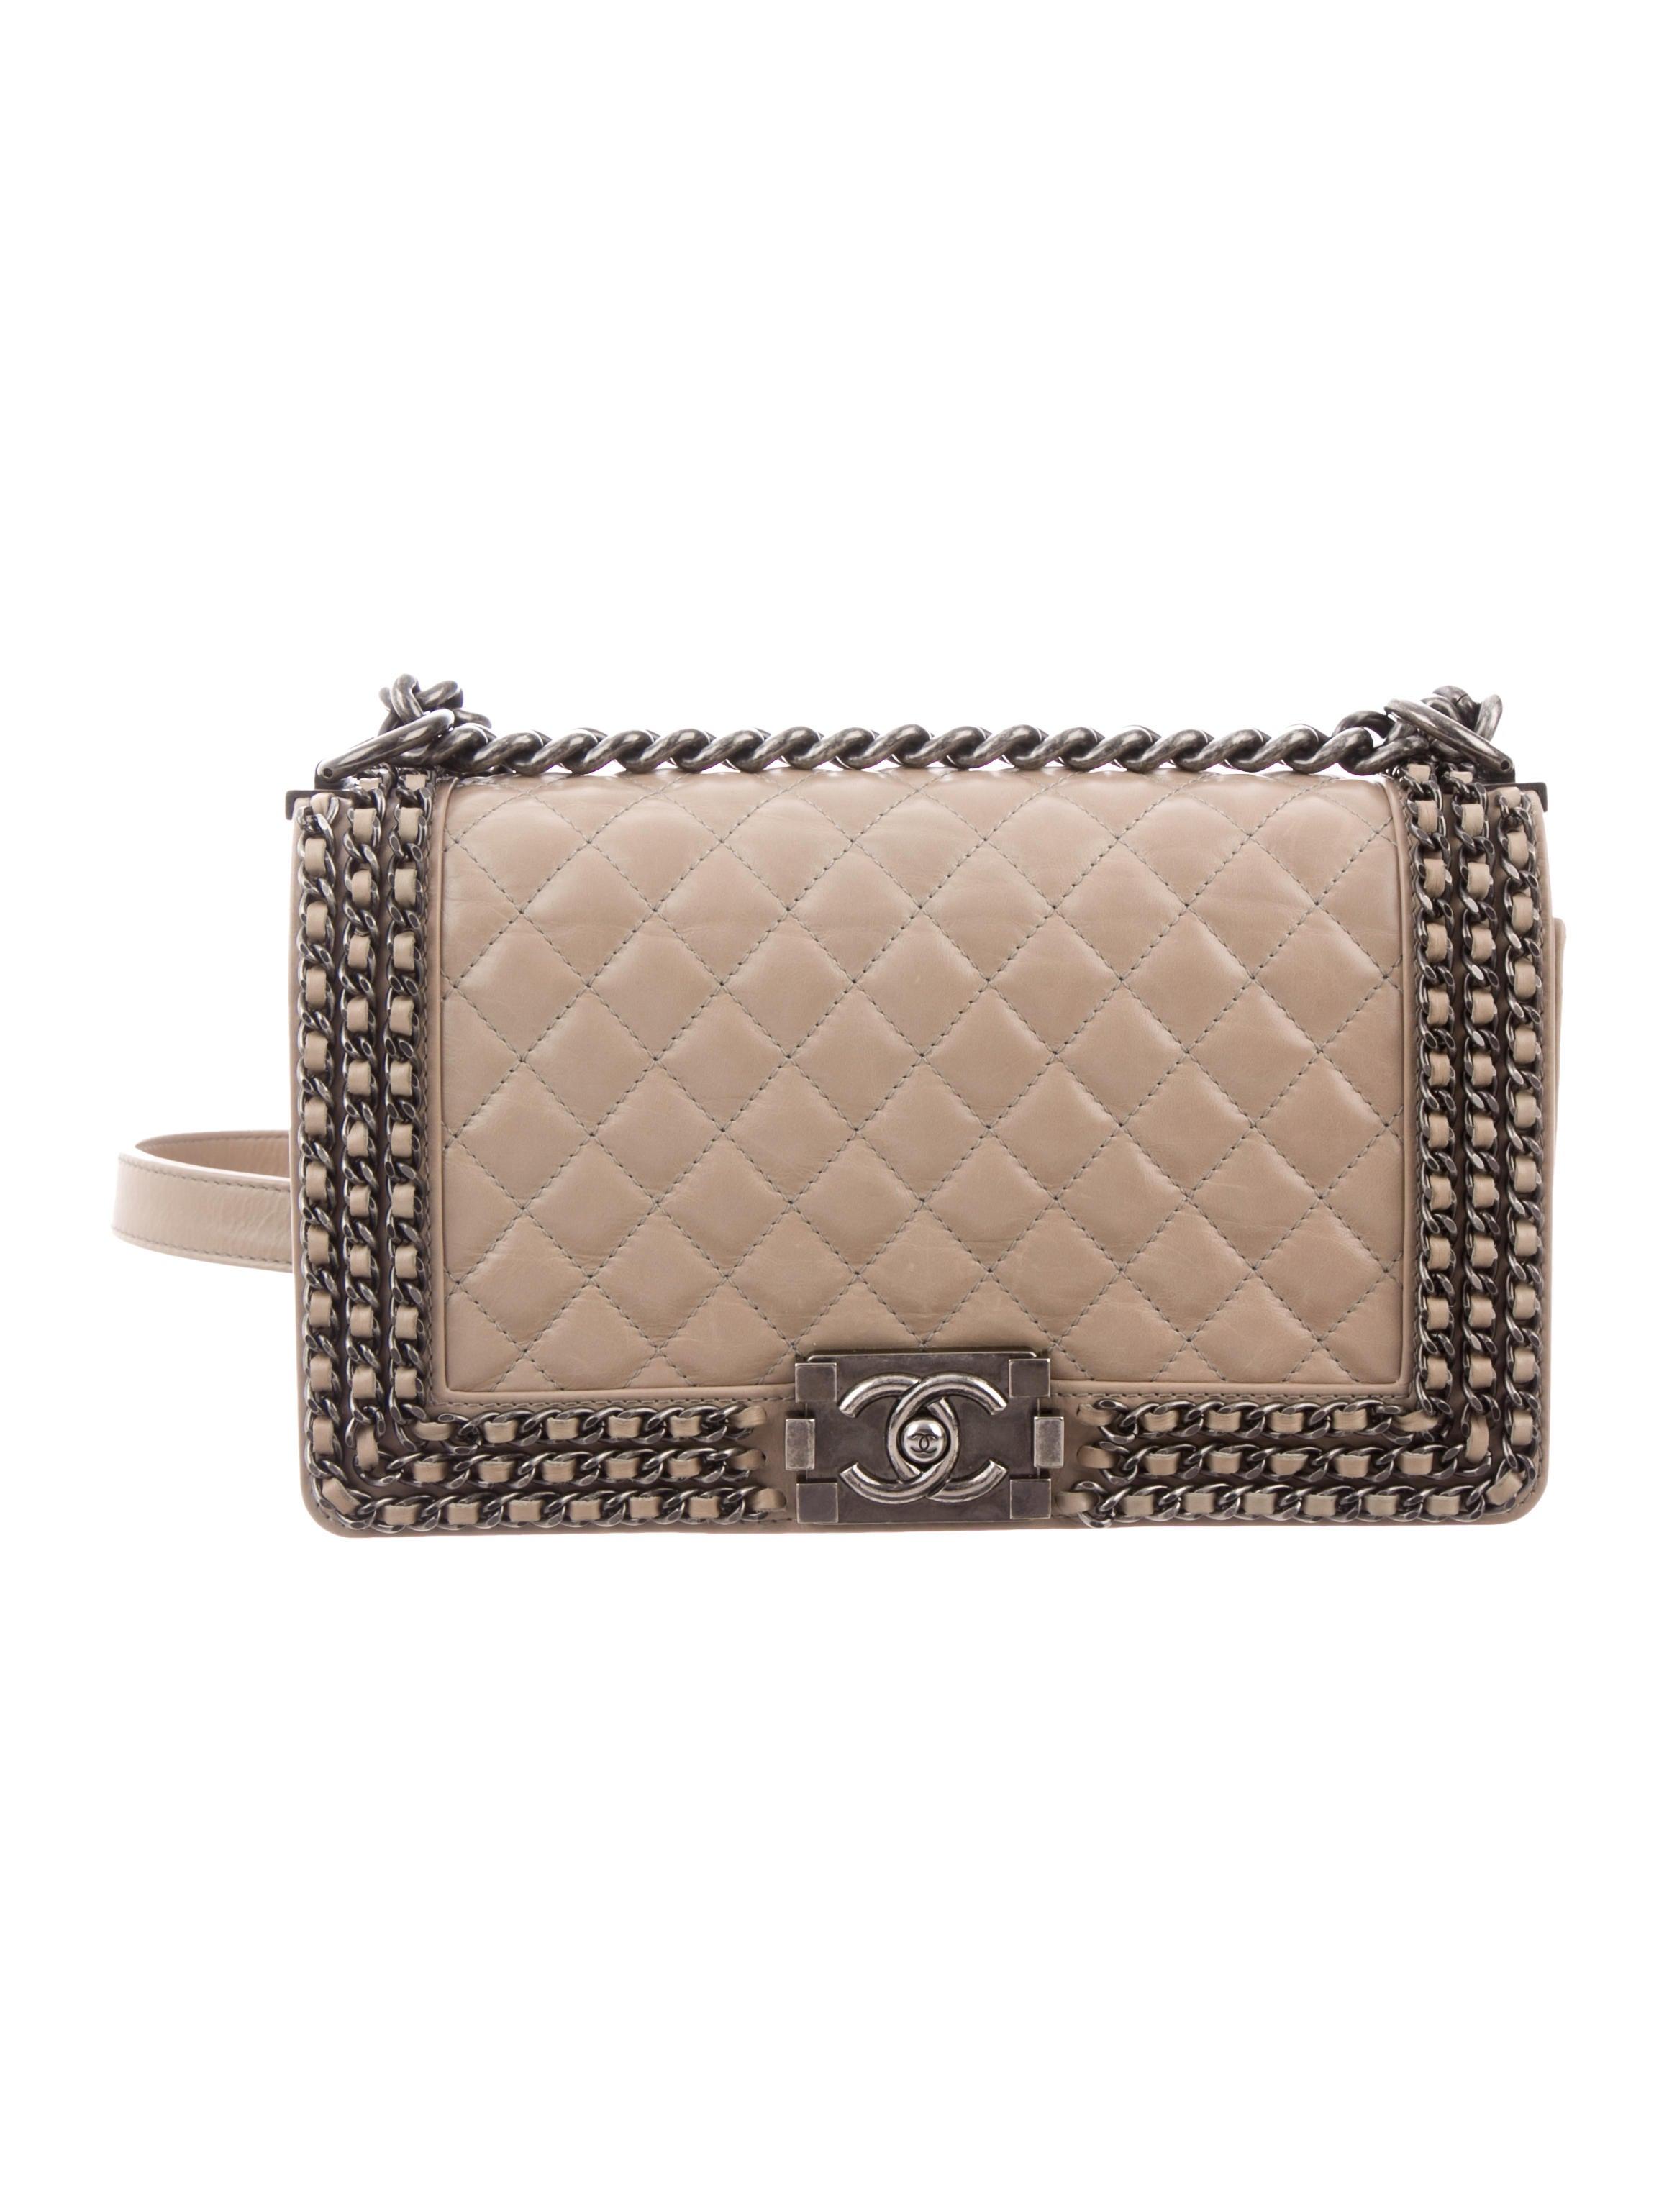 30657d2e190068 Chanel Chained Medium Boy Bag - Handbags - CHA271670   The RealReal